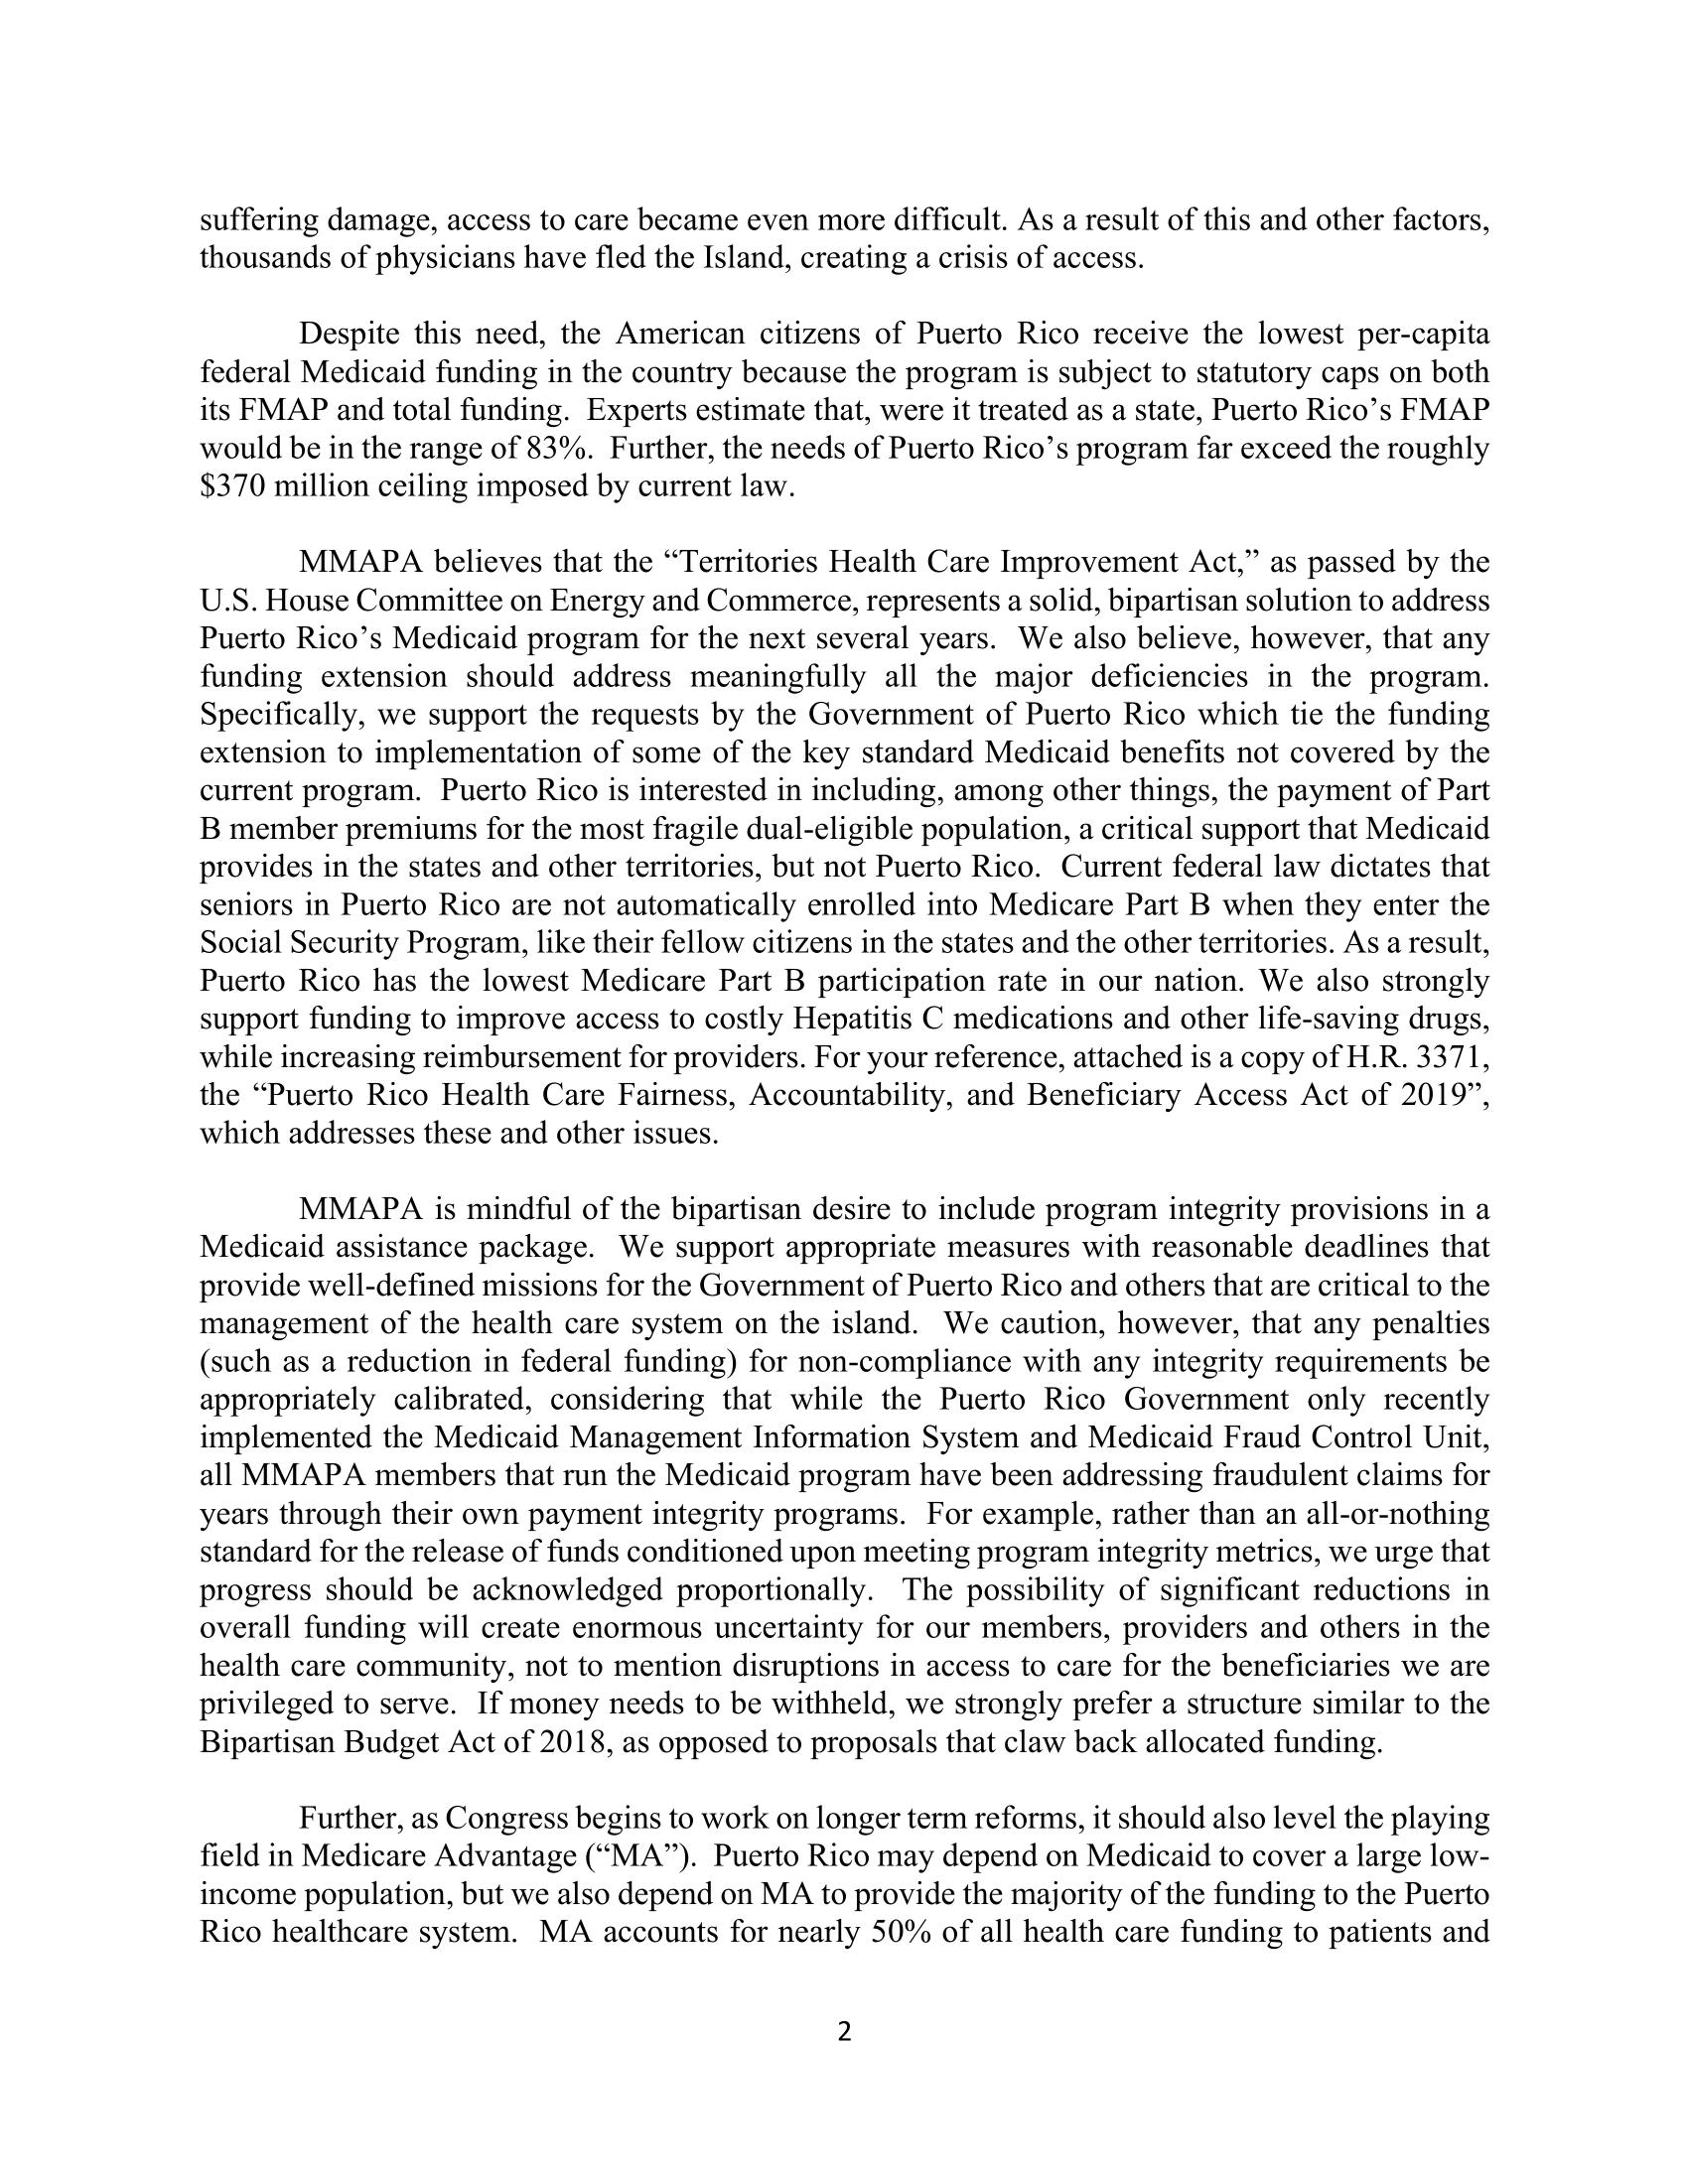 MMAPA Pallone-Walden-Grassley-Wyden Letter FINAL-2